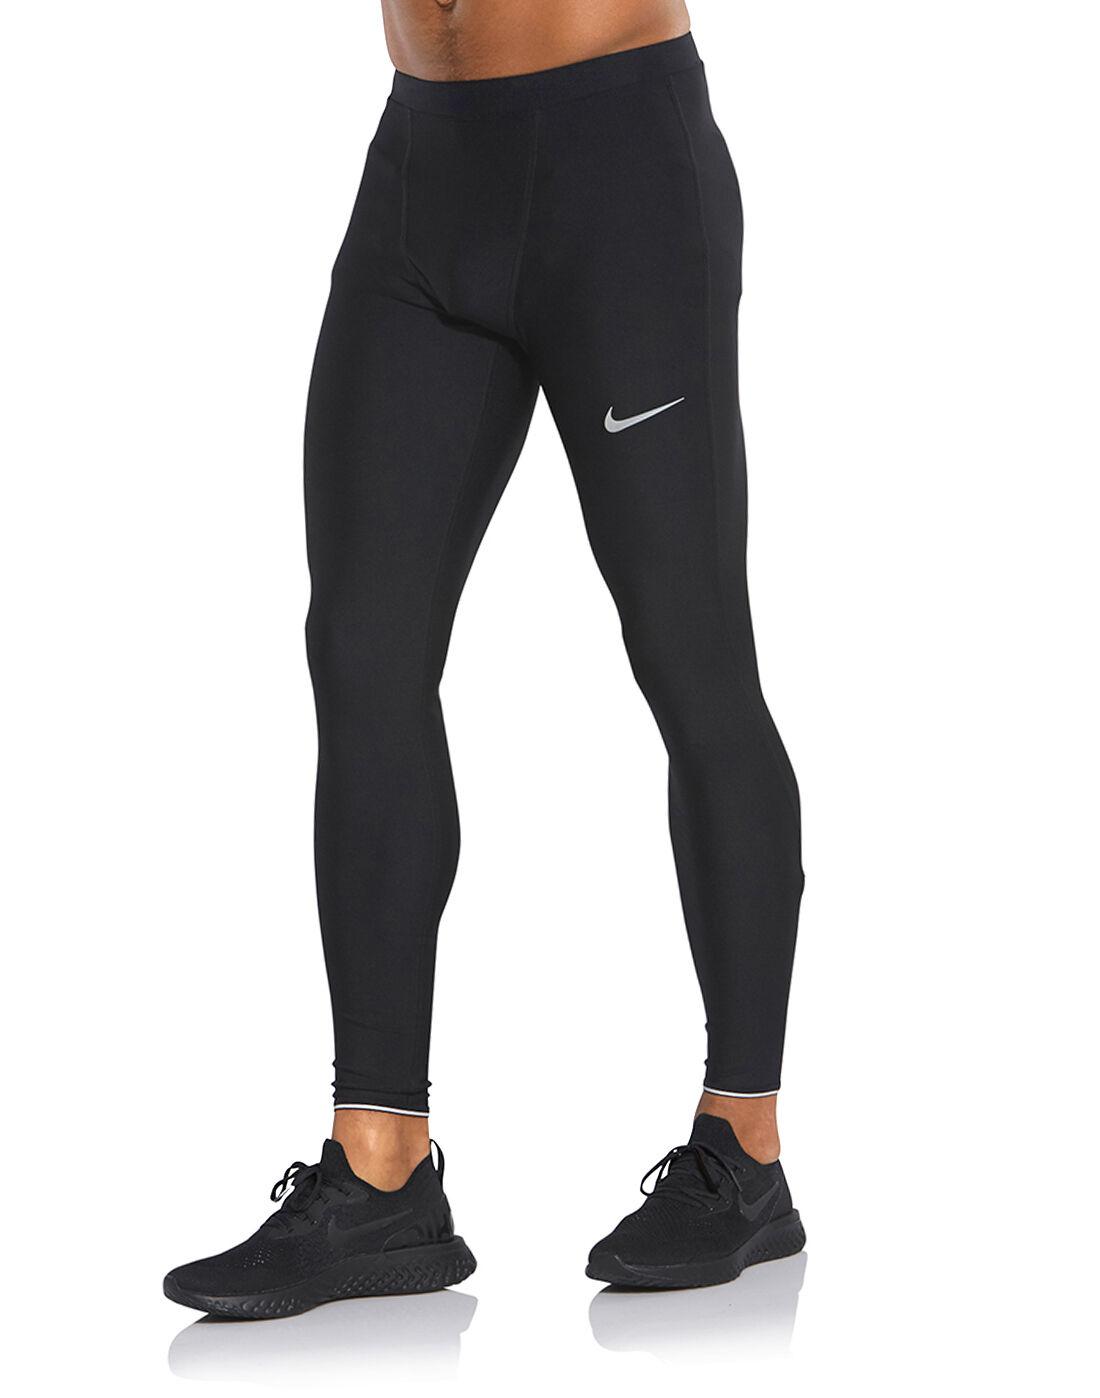 Men's Black Nike Running Tights | Life